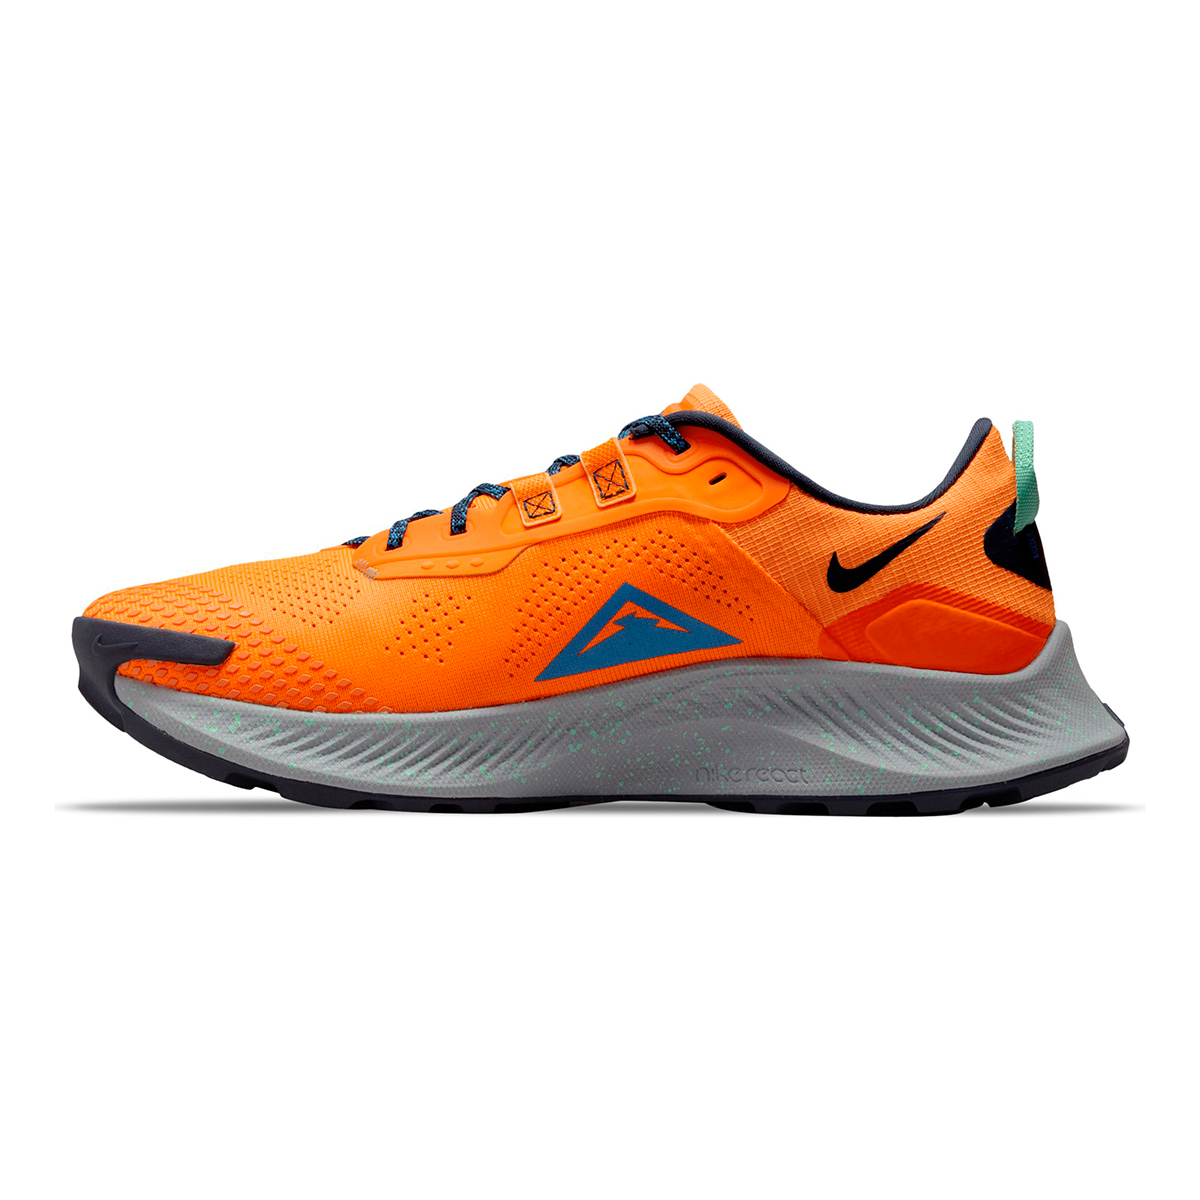 Men's Nike Pegasus Trail 3 Trail Running Shoe - Color: Total Orange/Signal Blue/Wolf Grey - Size: 6 - Width: Regular, Total Orange/Signal Blue/Wolf Grey, large, image 2